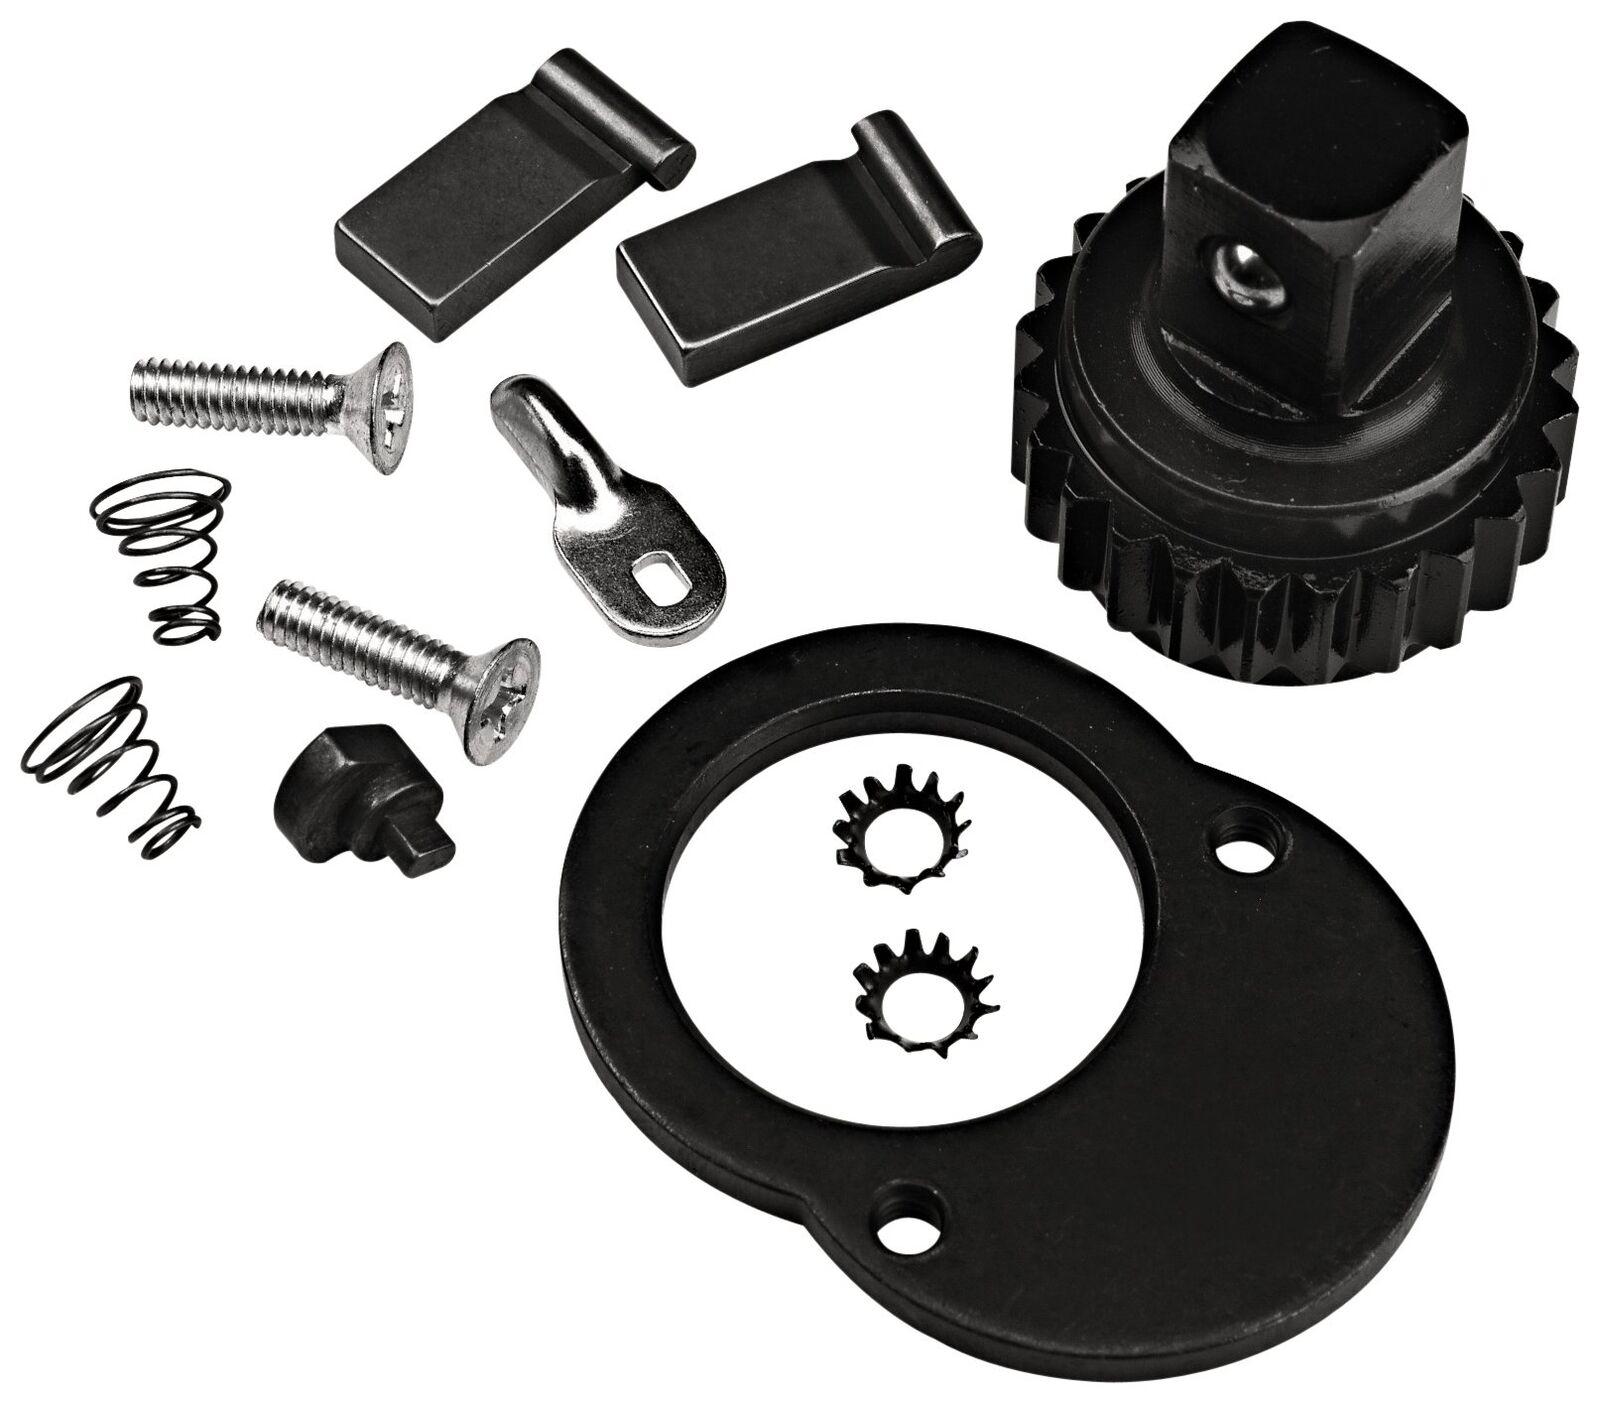 Stanley Predo J6018RK 3 4-Inch Drive Ratchet Head Repair Kit - Torque Wrench